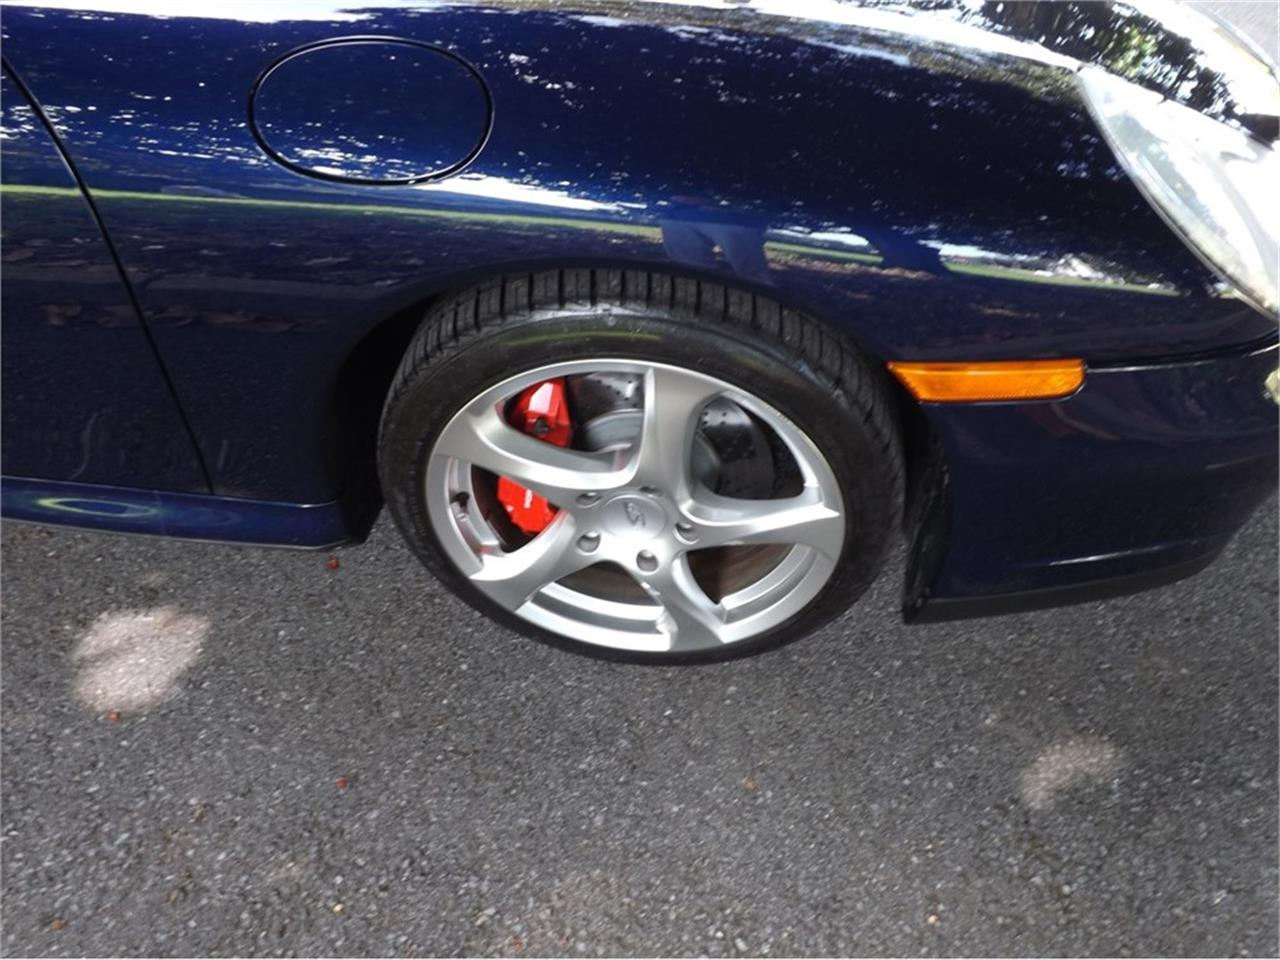 2002 Porsche 911 Carrera 4S (CC-1416484) for sale in Roanoke, Virginia